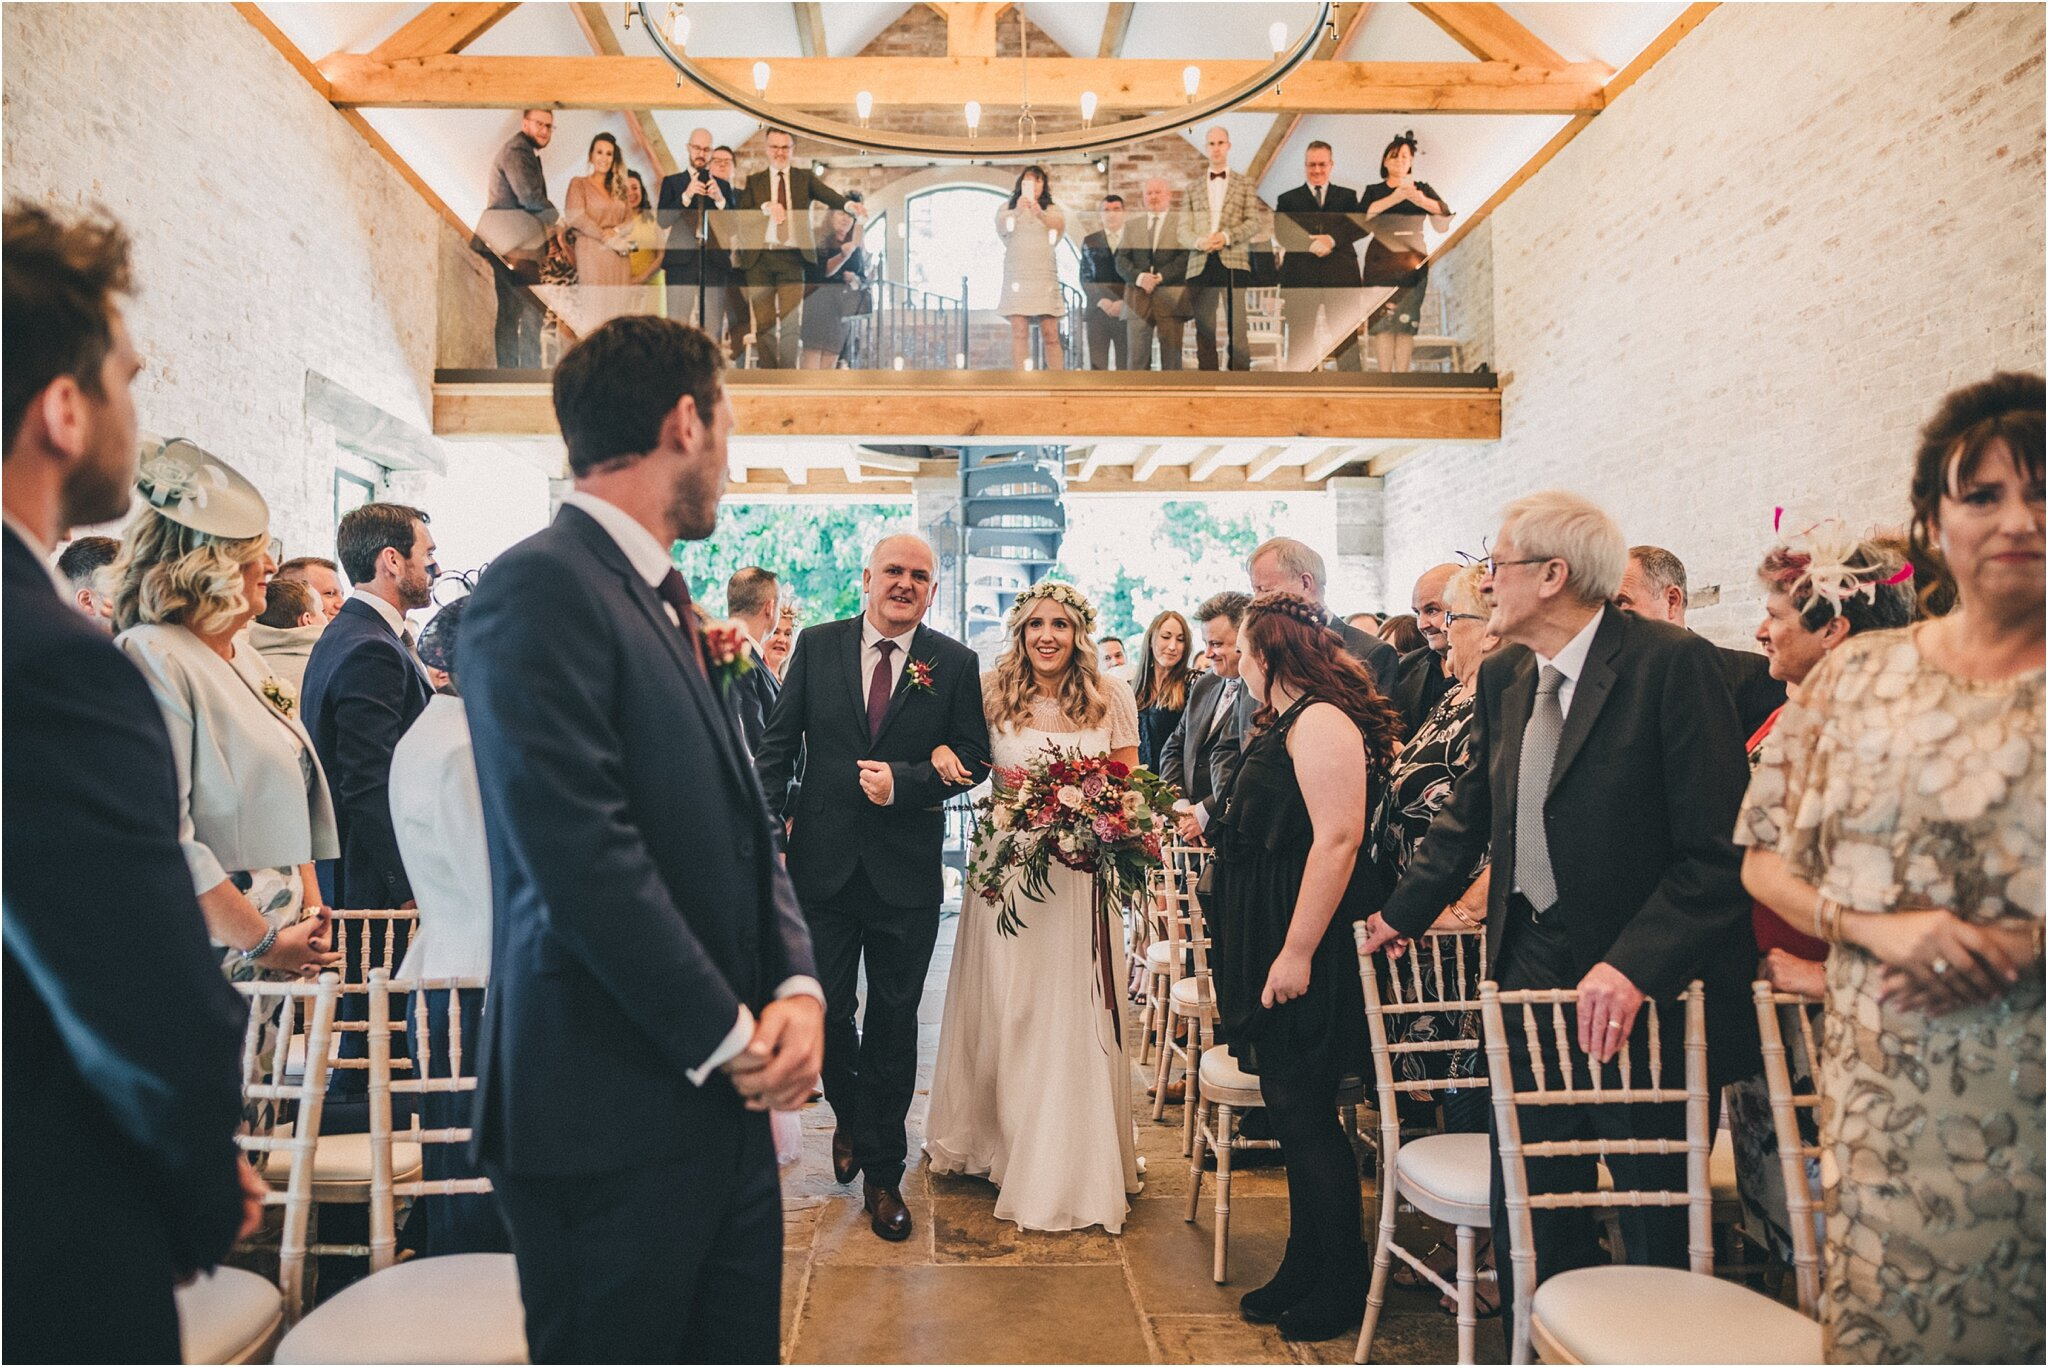 Dorfold Hall marquee wedding 00016.jpg